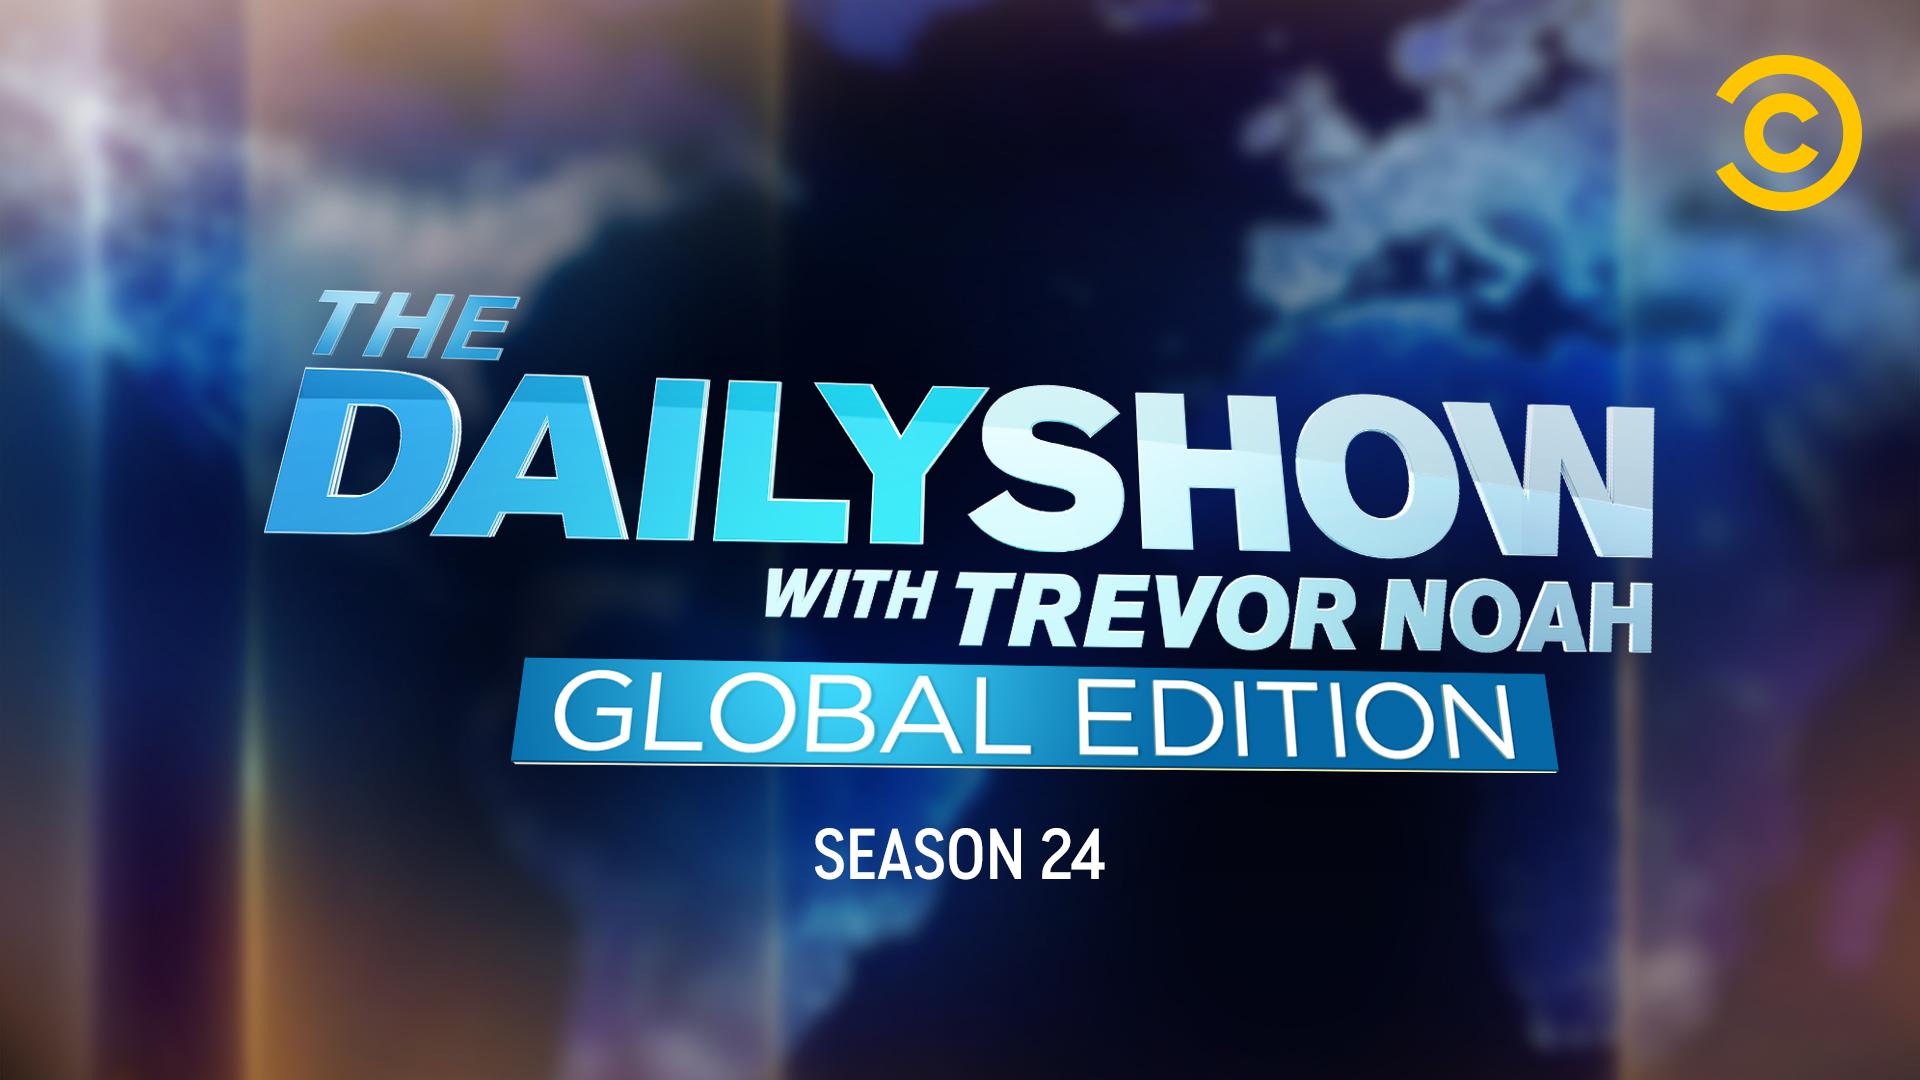 The Daily Show with Trevor Noah: Global Edition Season 24